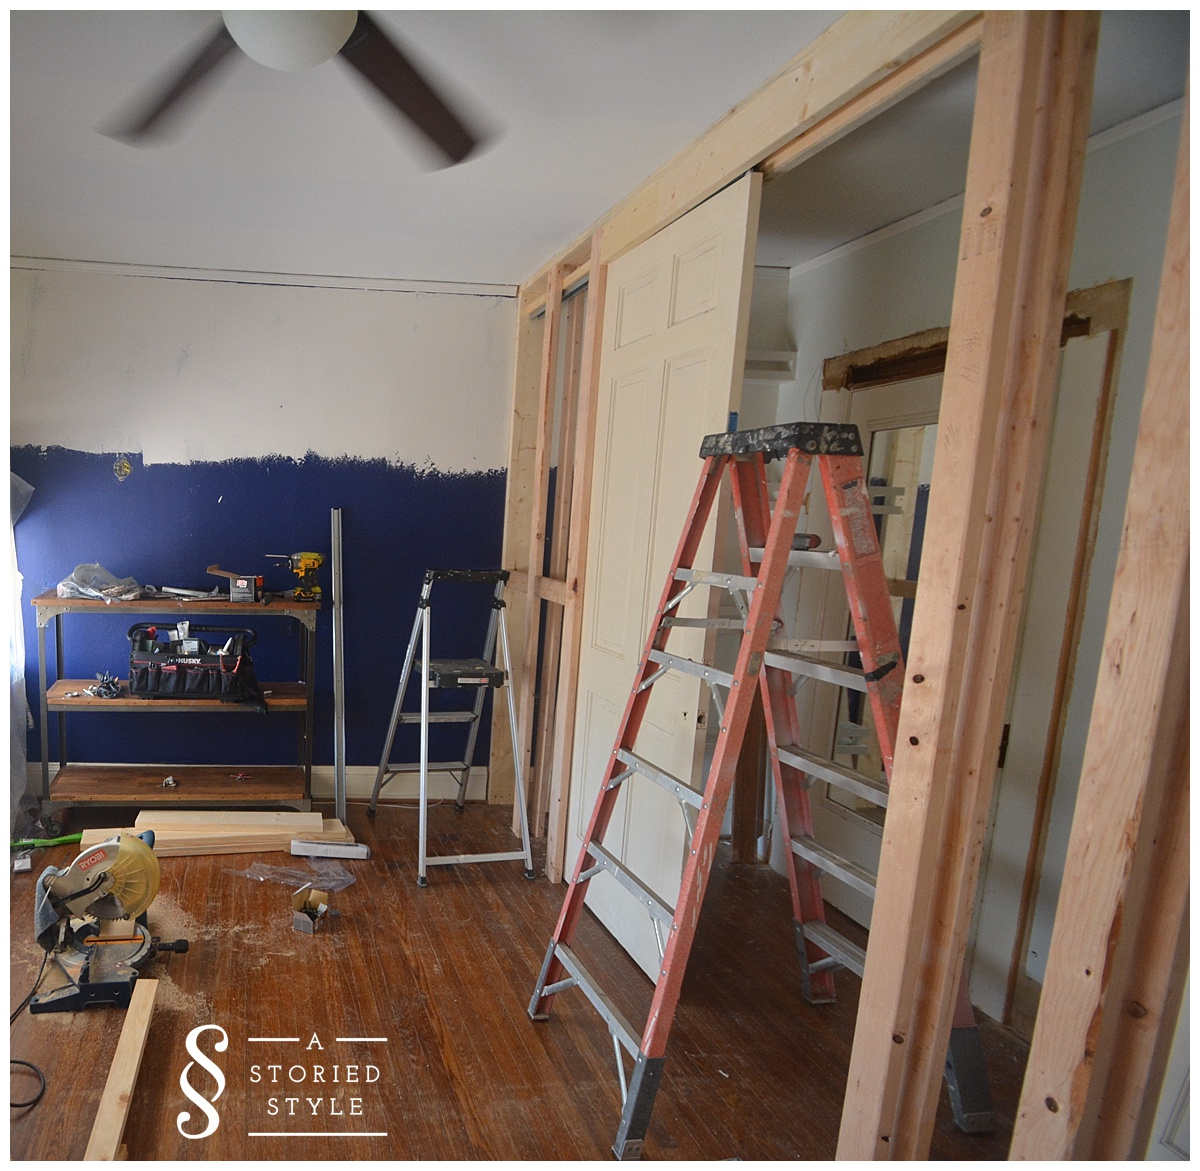 Ordinaire One Room Challenge U2013 Weeks 3 U0026 4 U2013 Adding A Closet